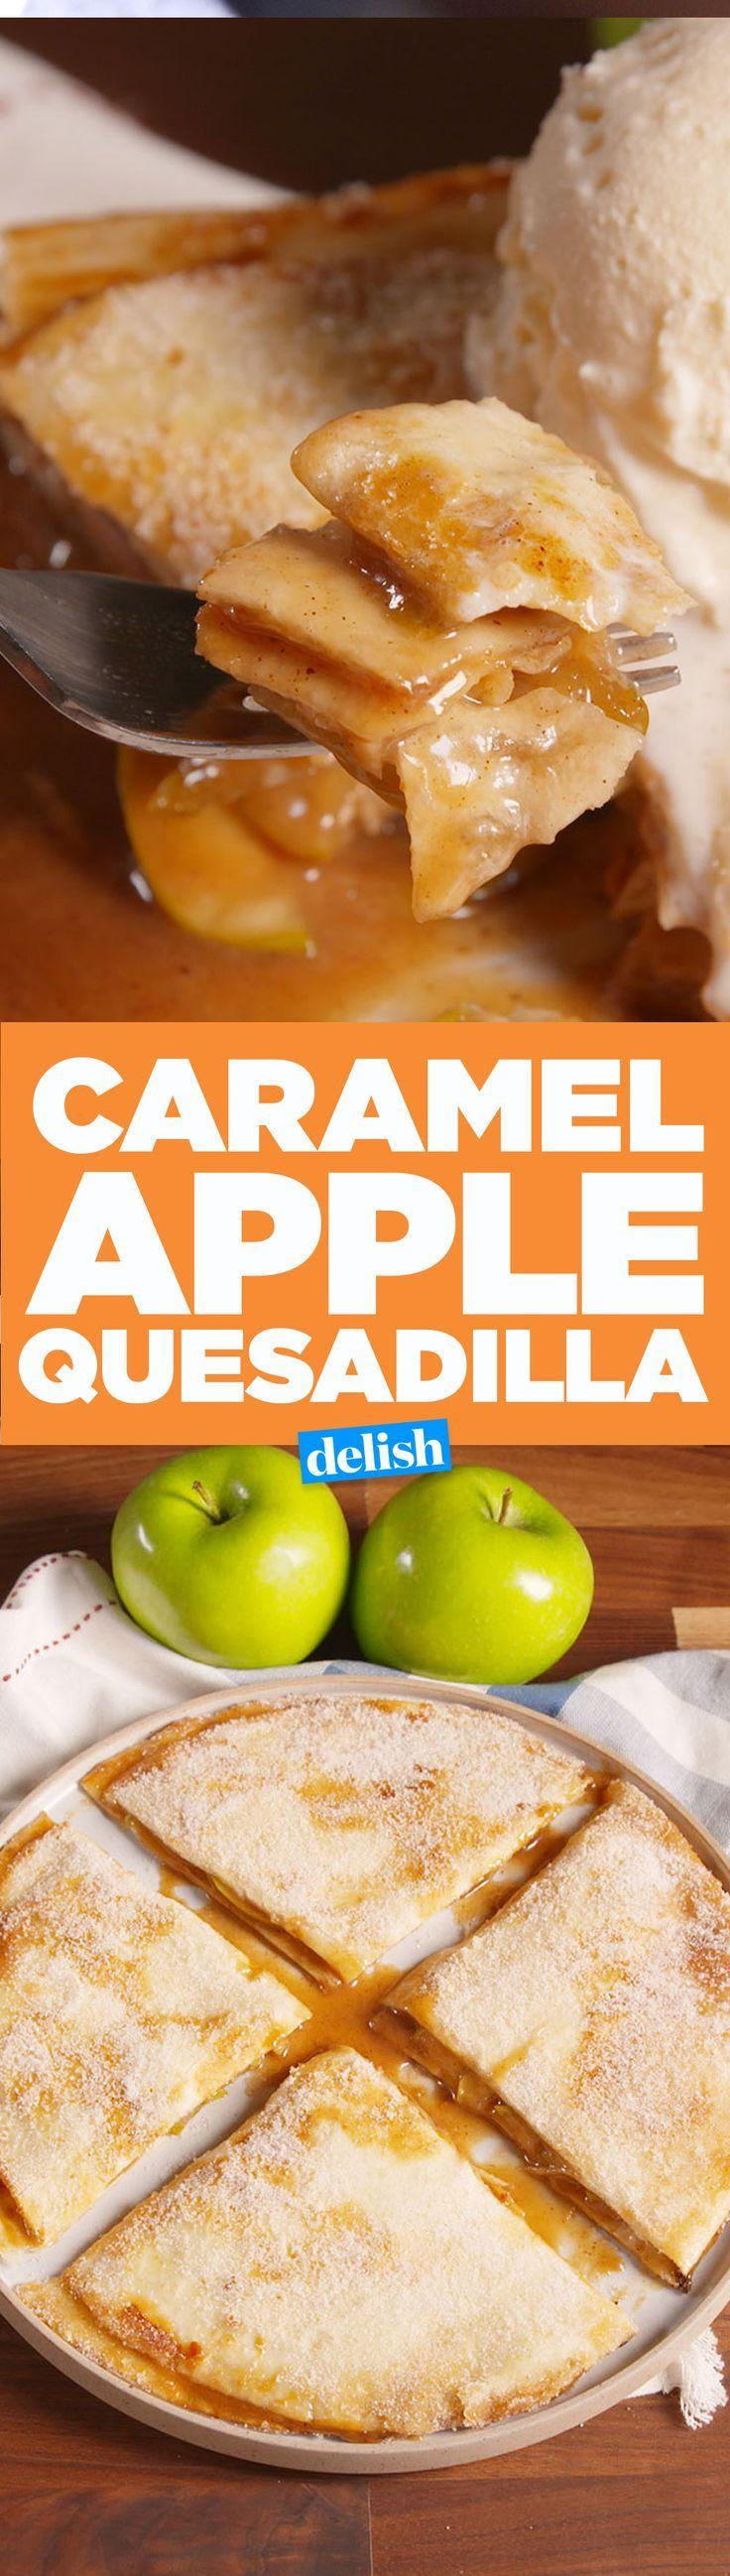 Caramel Apple Quesadillas